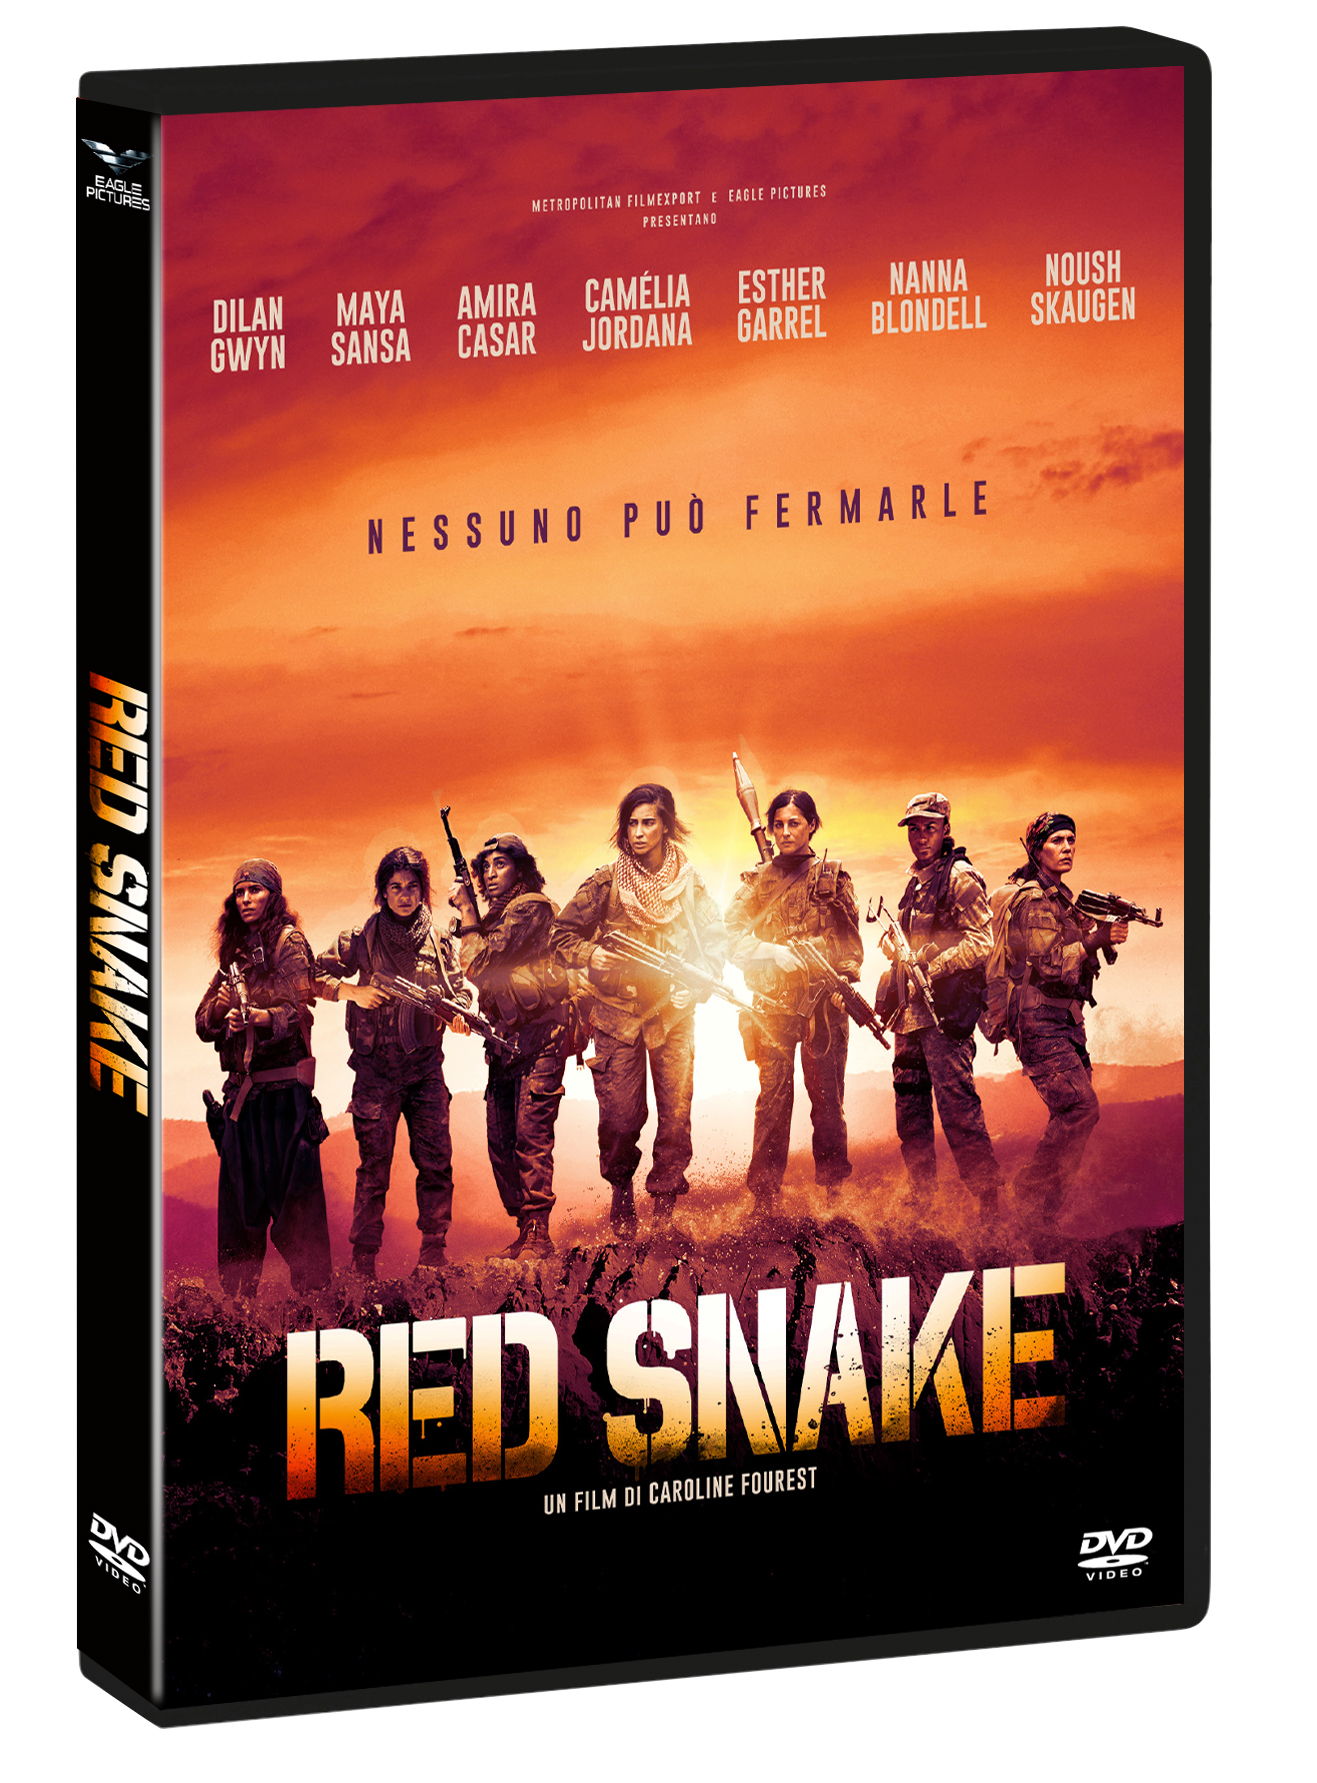 RED SNAKE (DVD)